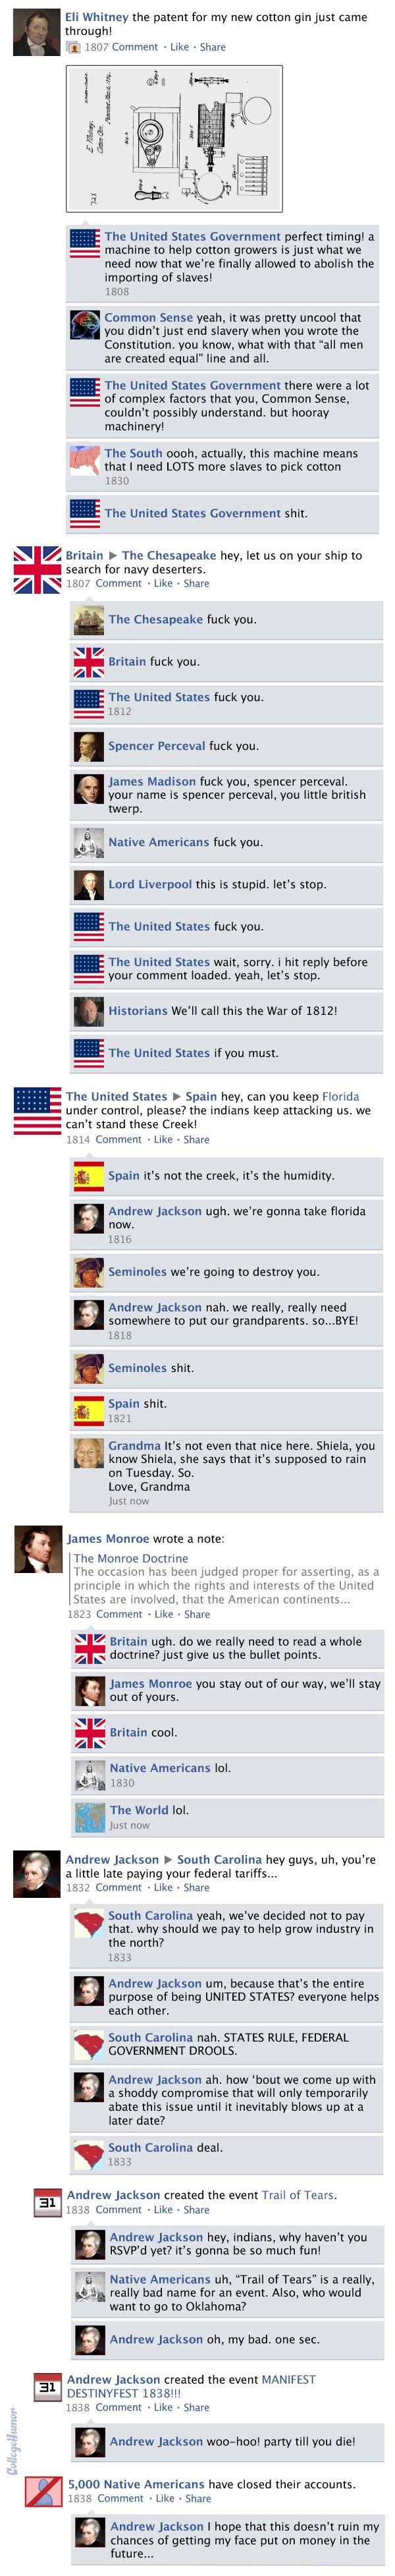 Facebook News Feed History of the World > Antebellum